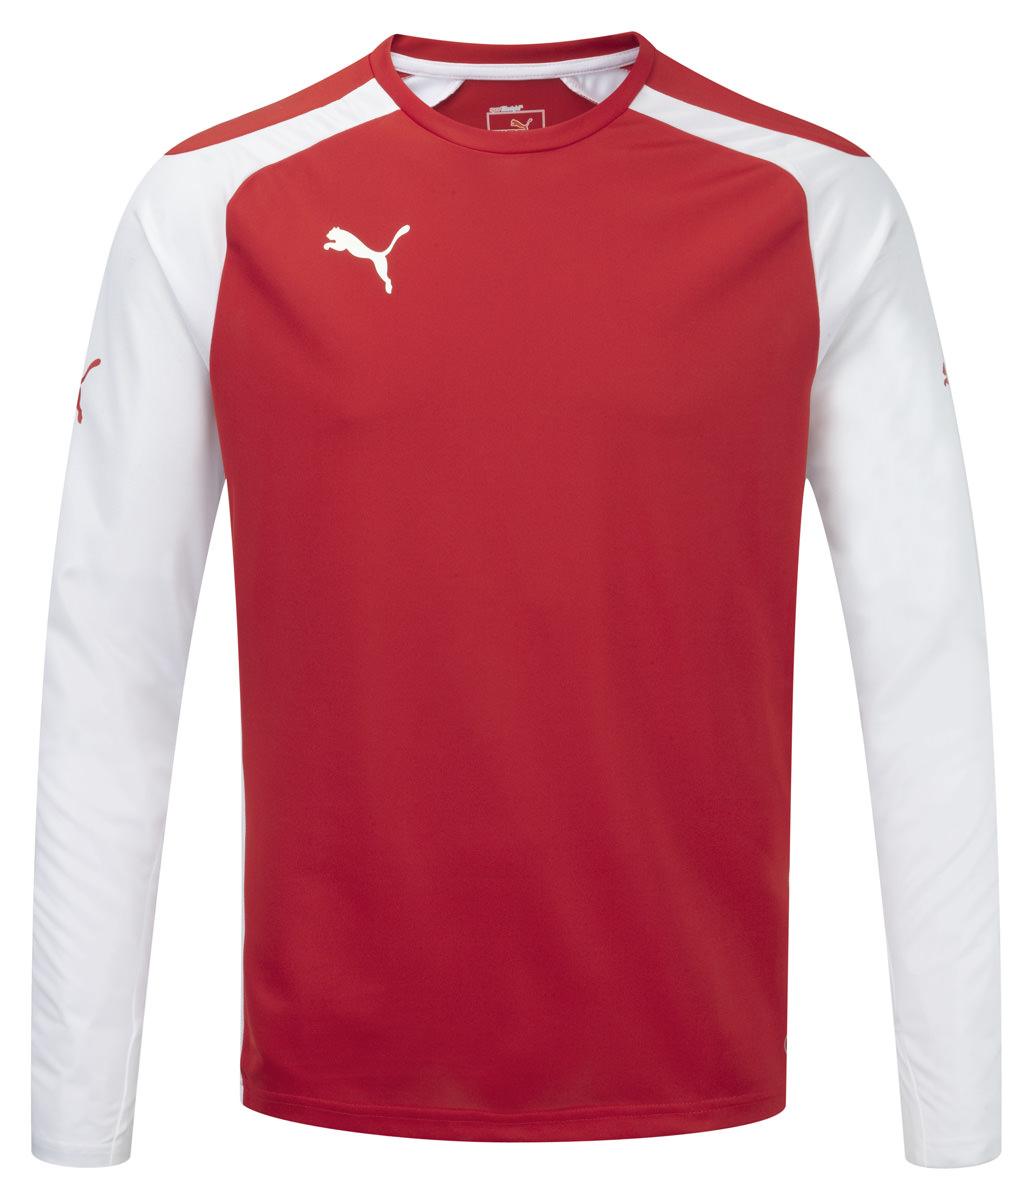 Puma Speed L/S Shirt - Red-White